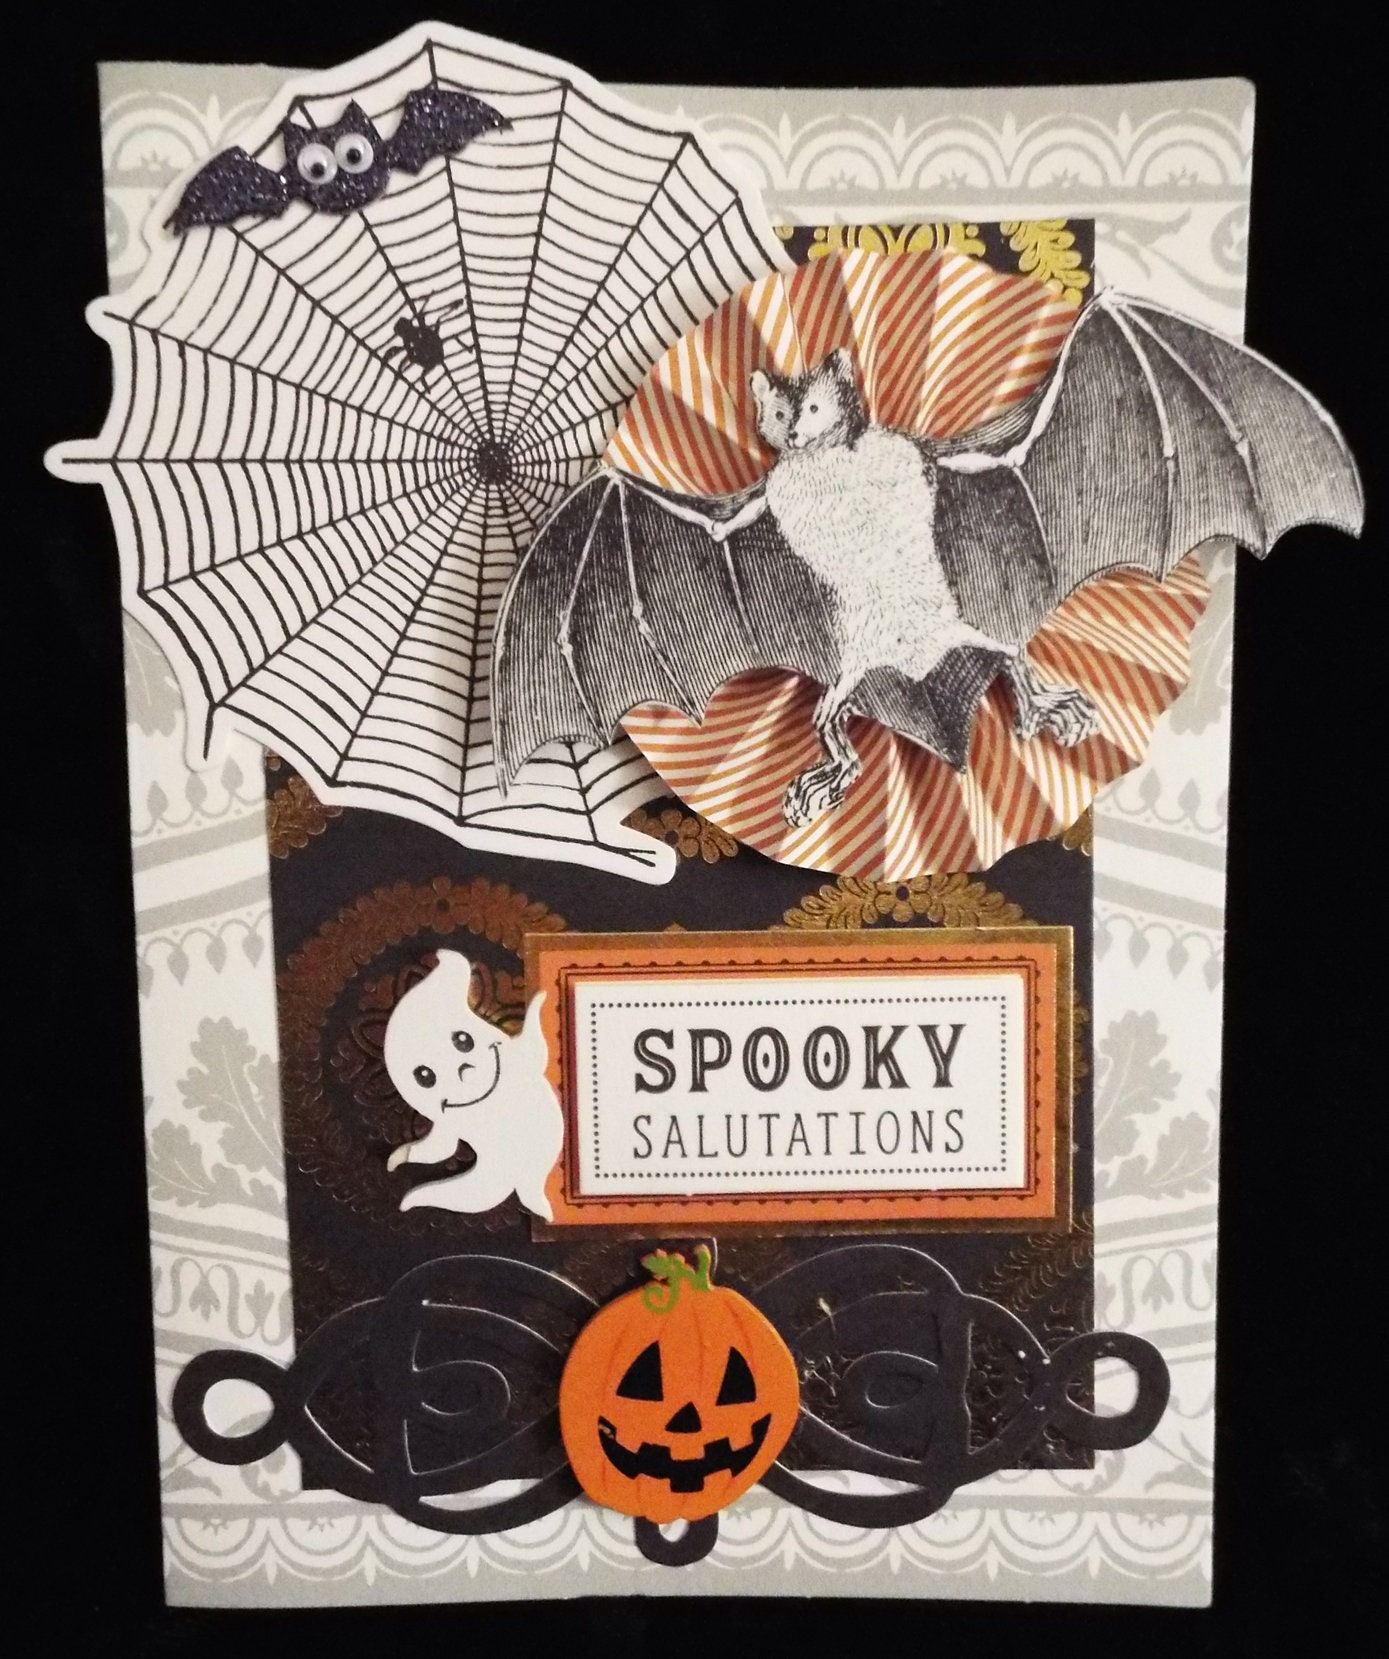 spooky salutations halloween card | etsy